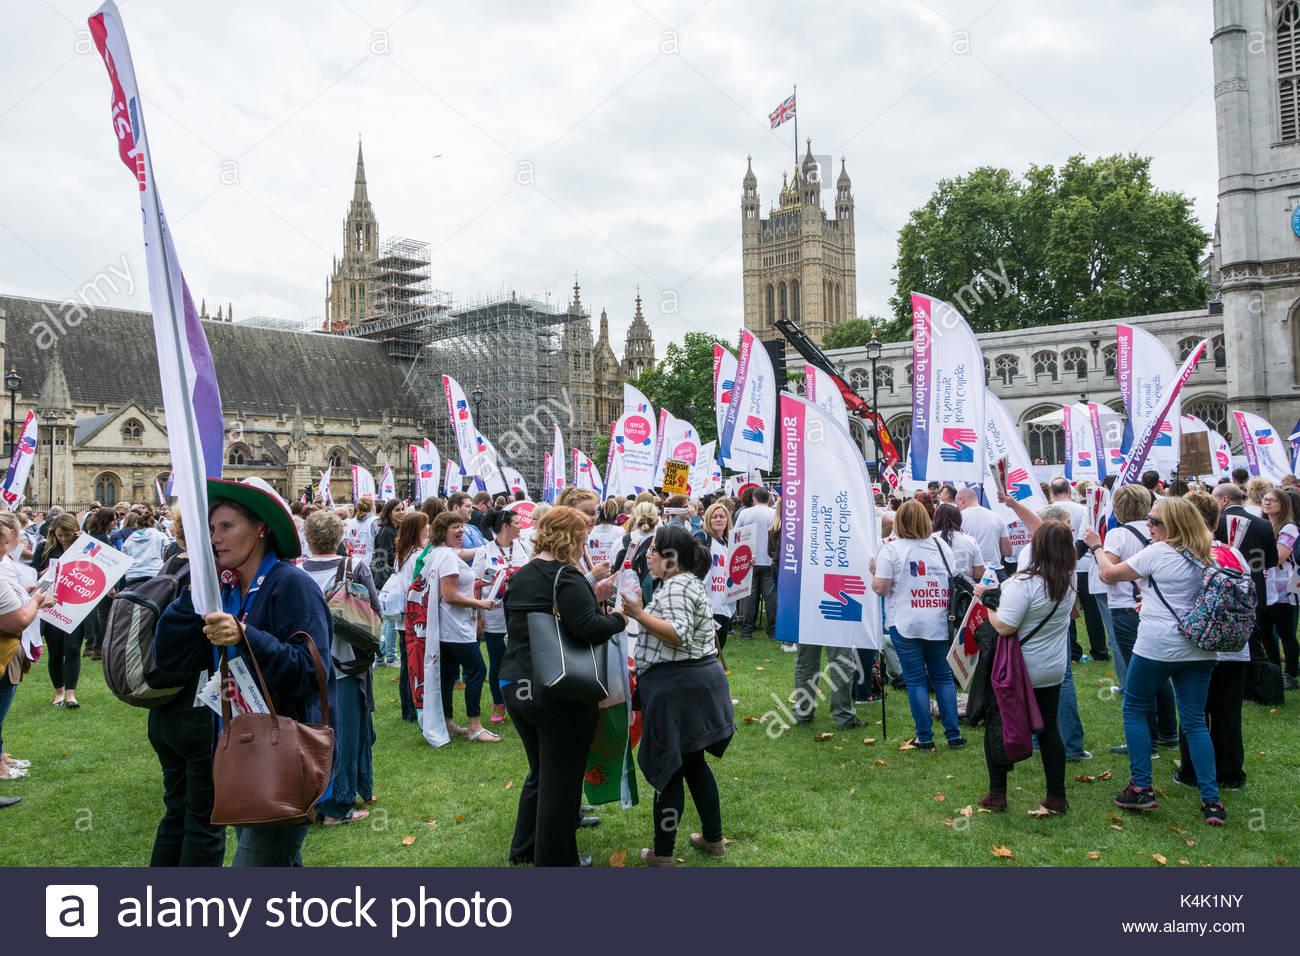 London, UK. , . Royal College of Nursing Smash the Cap demonstration in Parliament Square, London, England, UK. - Stock Image